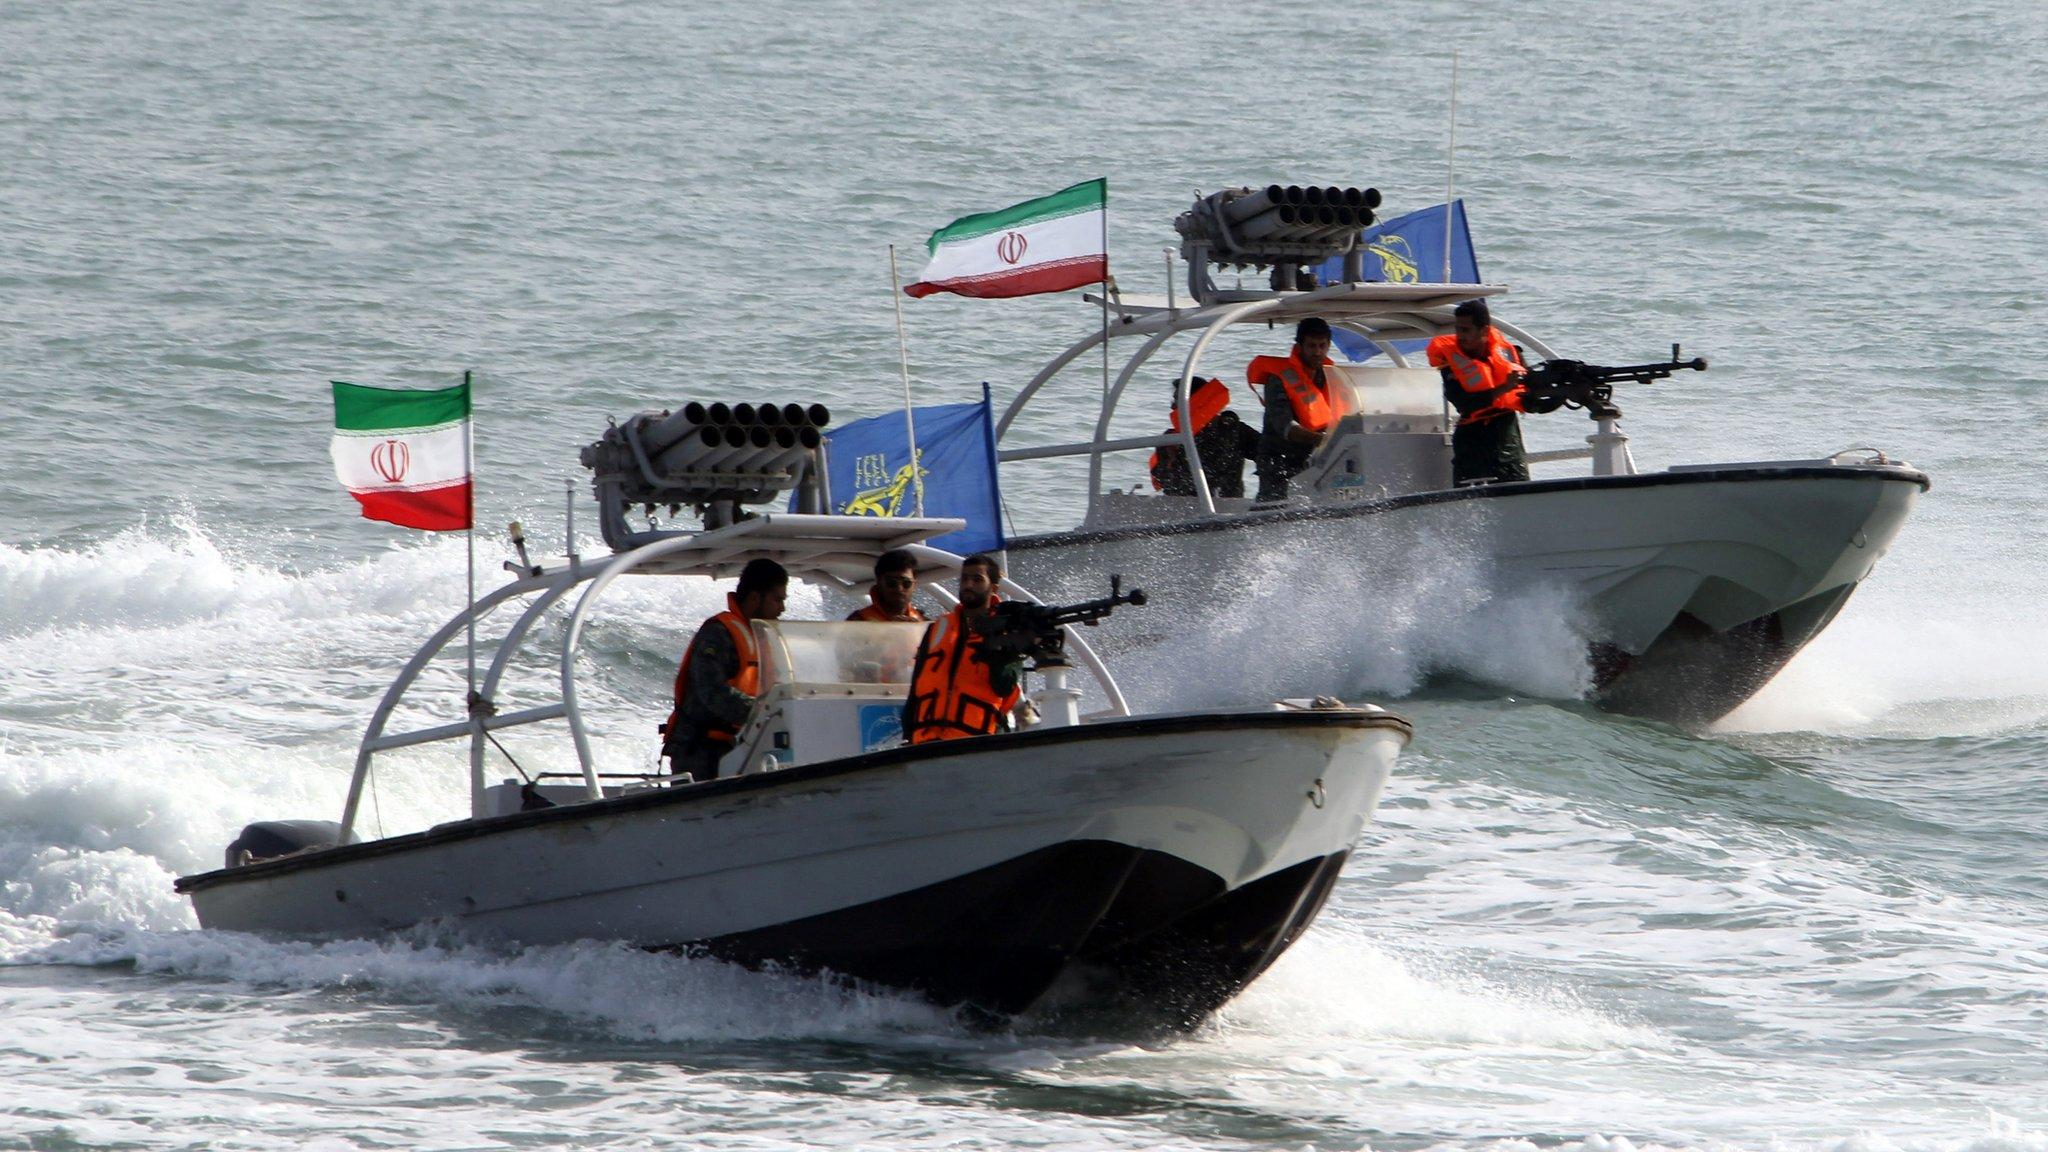 Iran 'seizes Saudi Arabian fishing boat in Gulf'